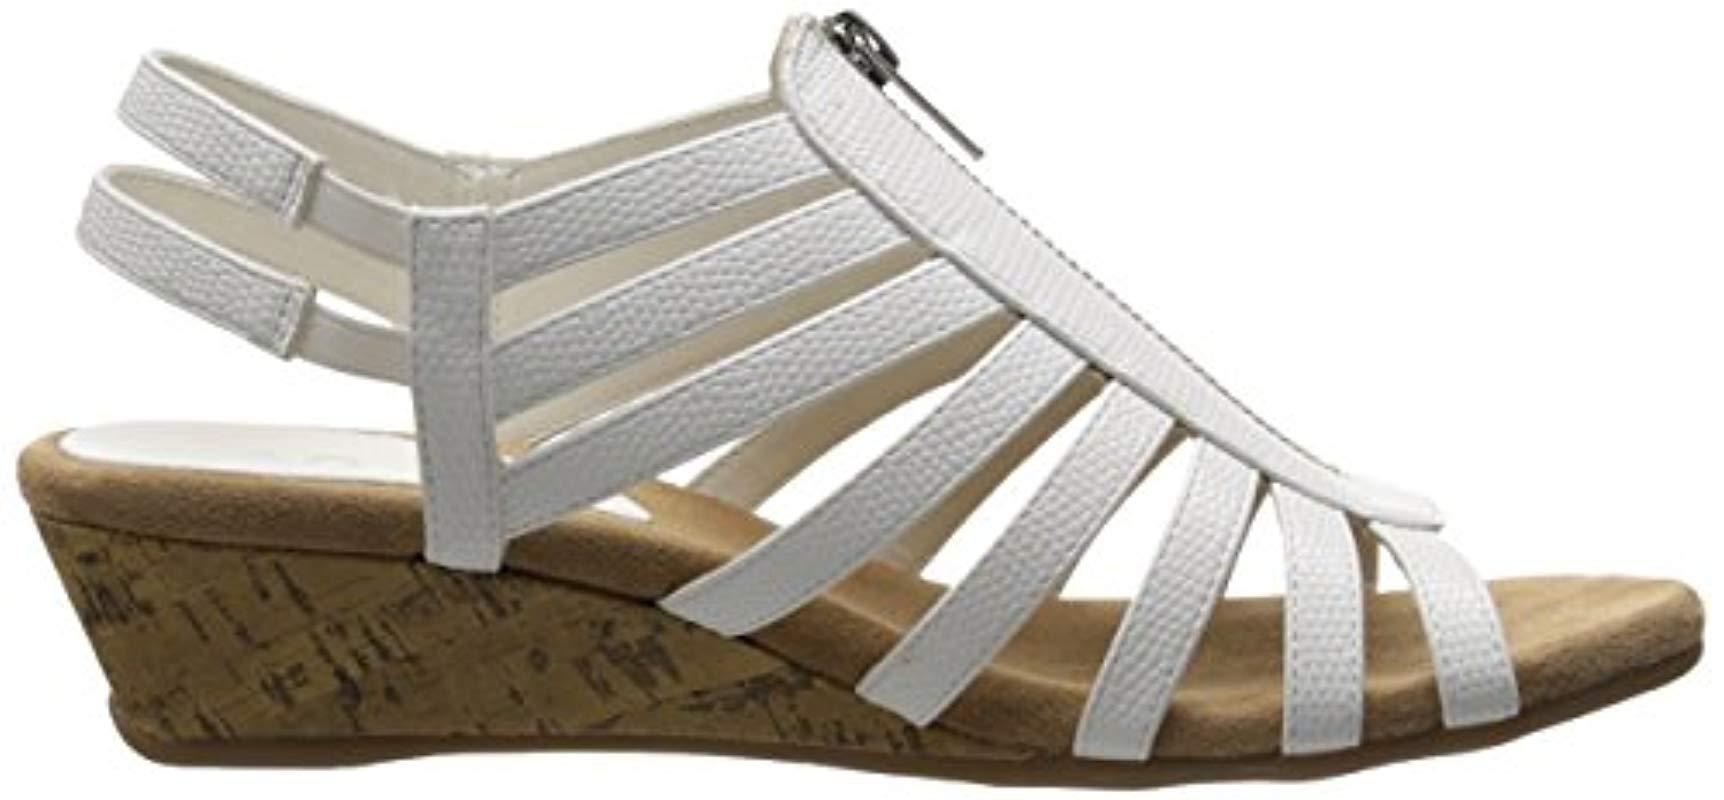 5c04836e53ea Lyst - Aerosoles A2 Yetaway Wedge Sandal in White - Save 3%